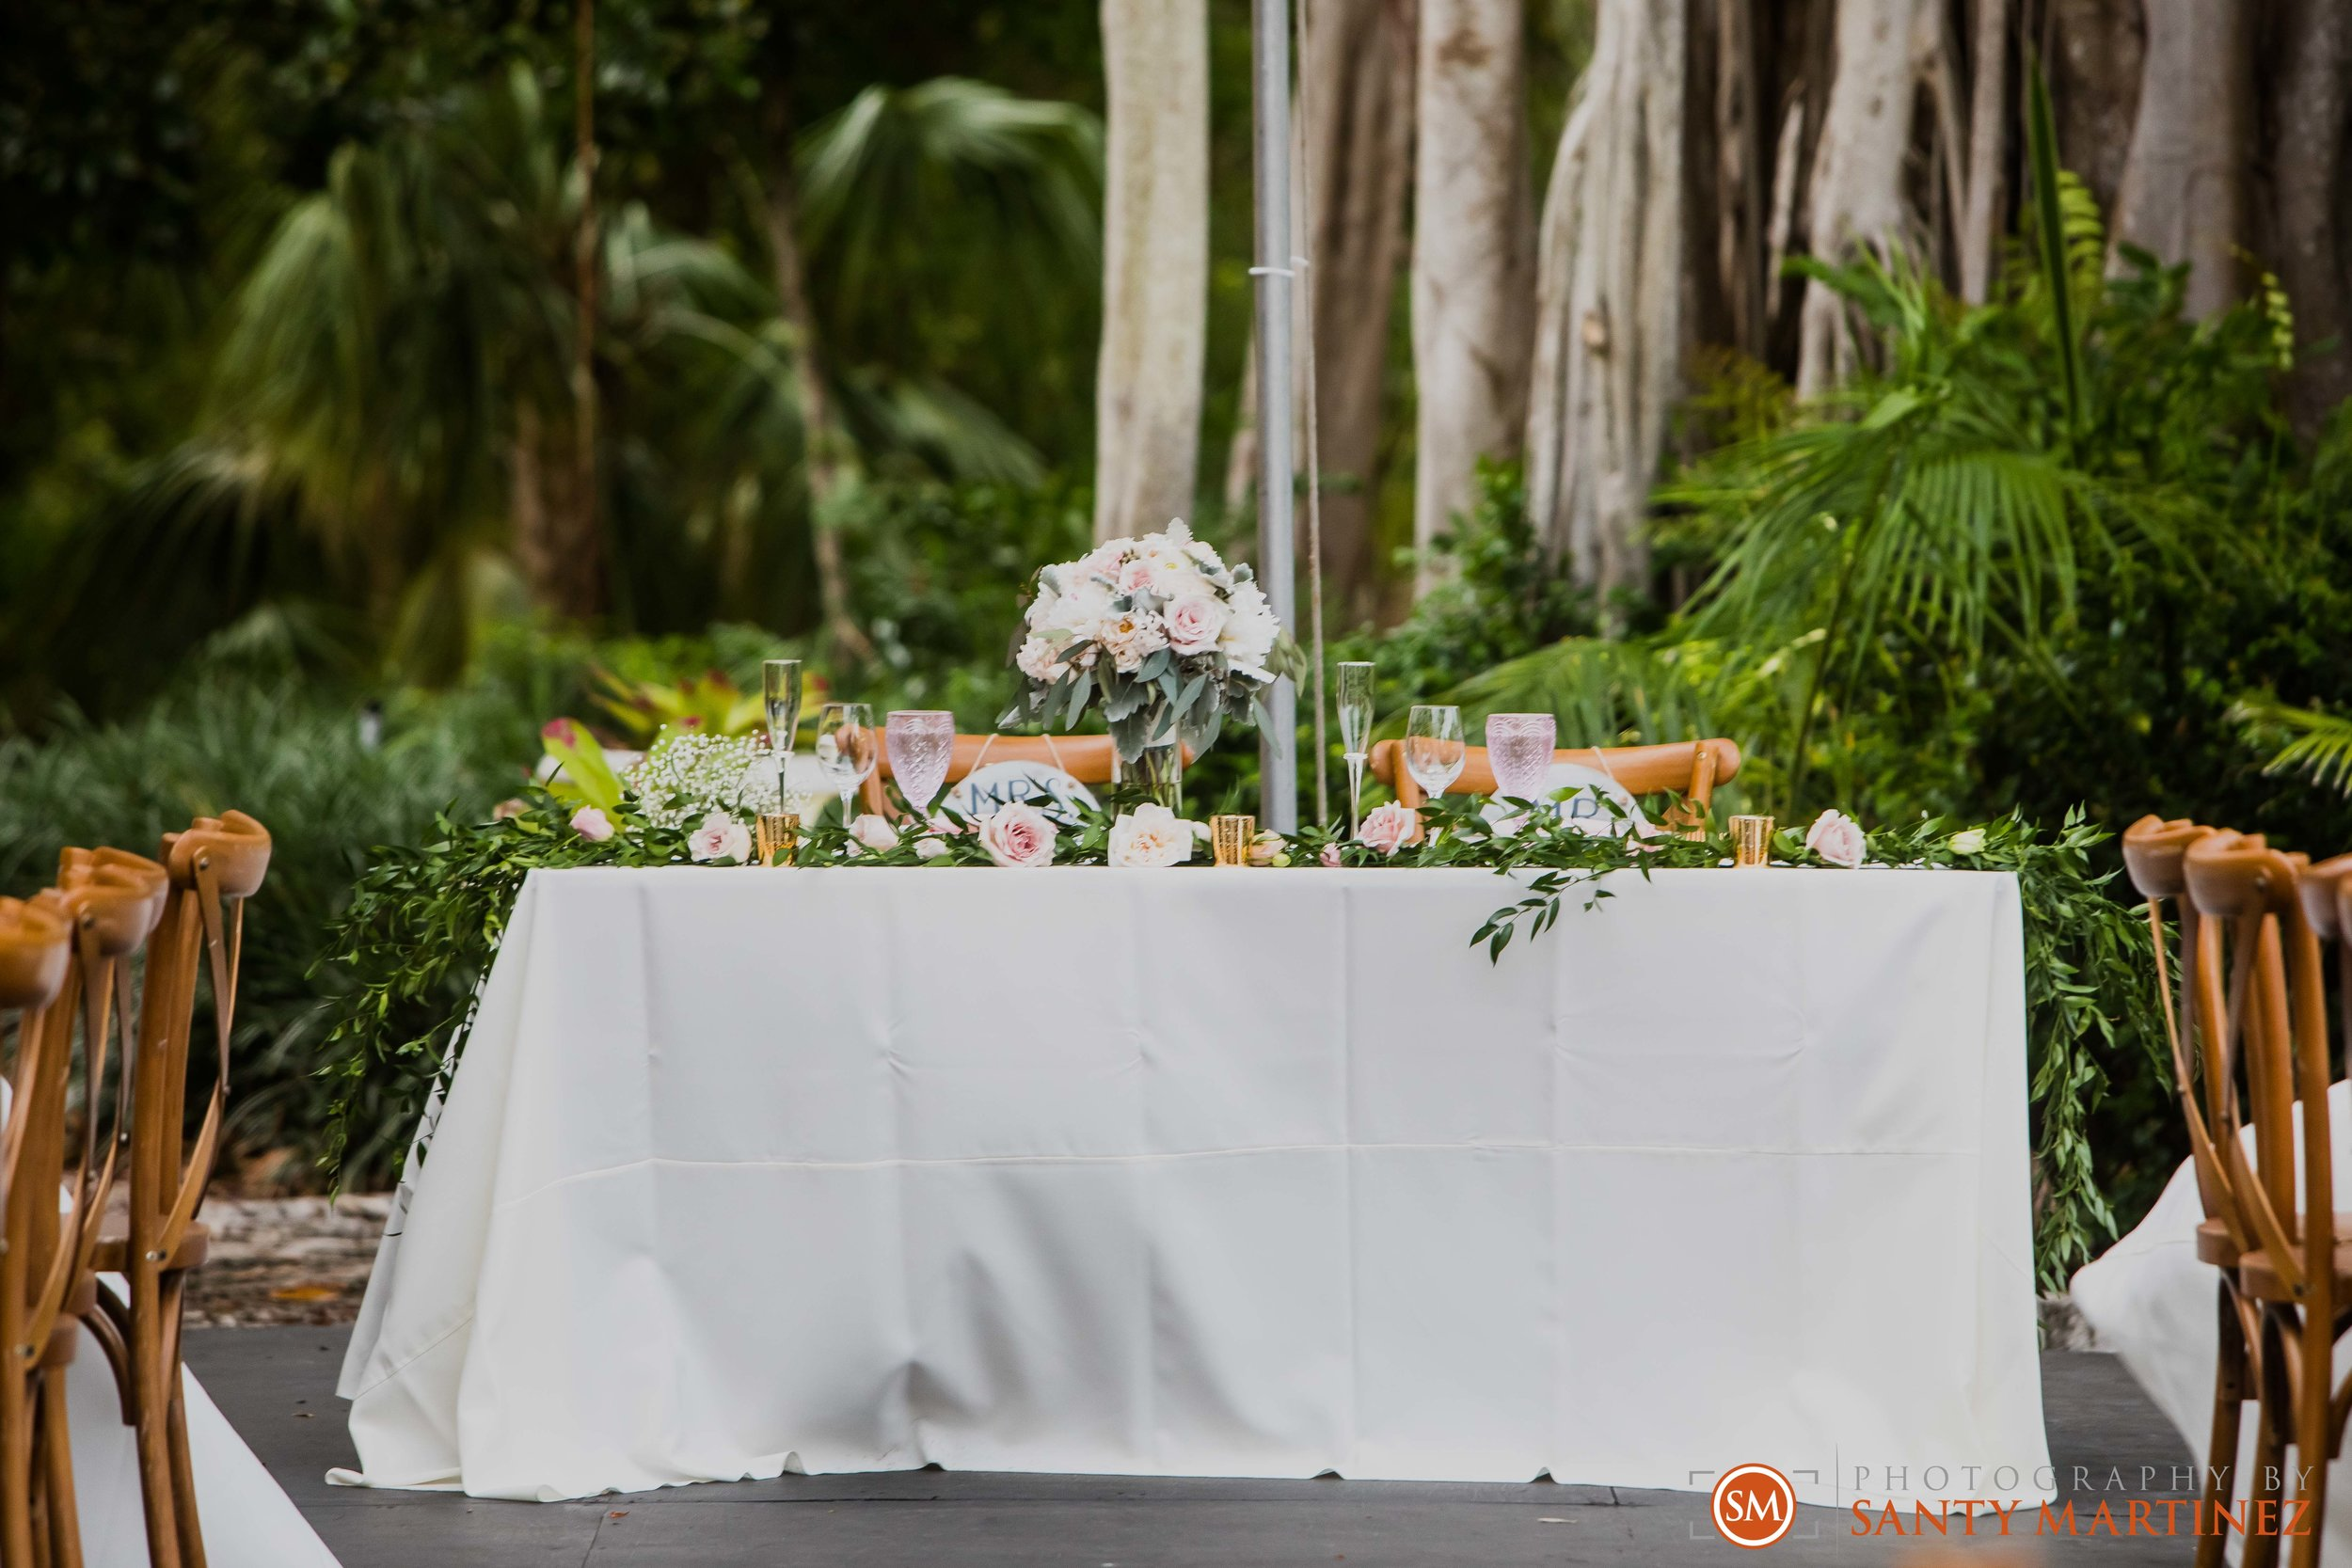 Wedding Bonnet House - Santy Martinez Photography-48.jpg